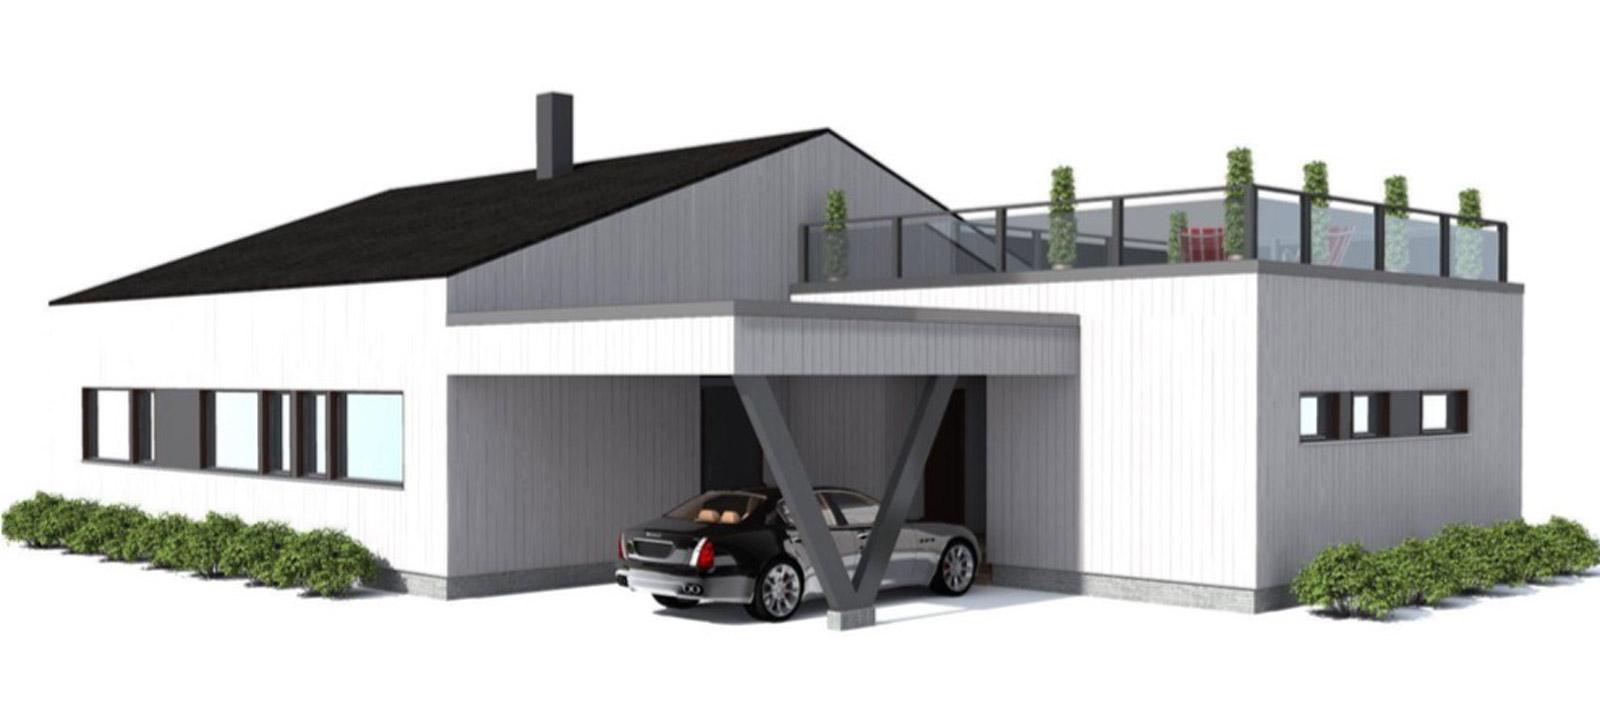 WoodVille design Houtbouw Woning | Zensation